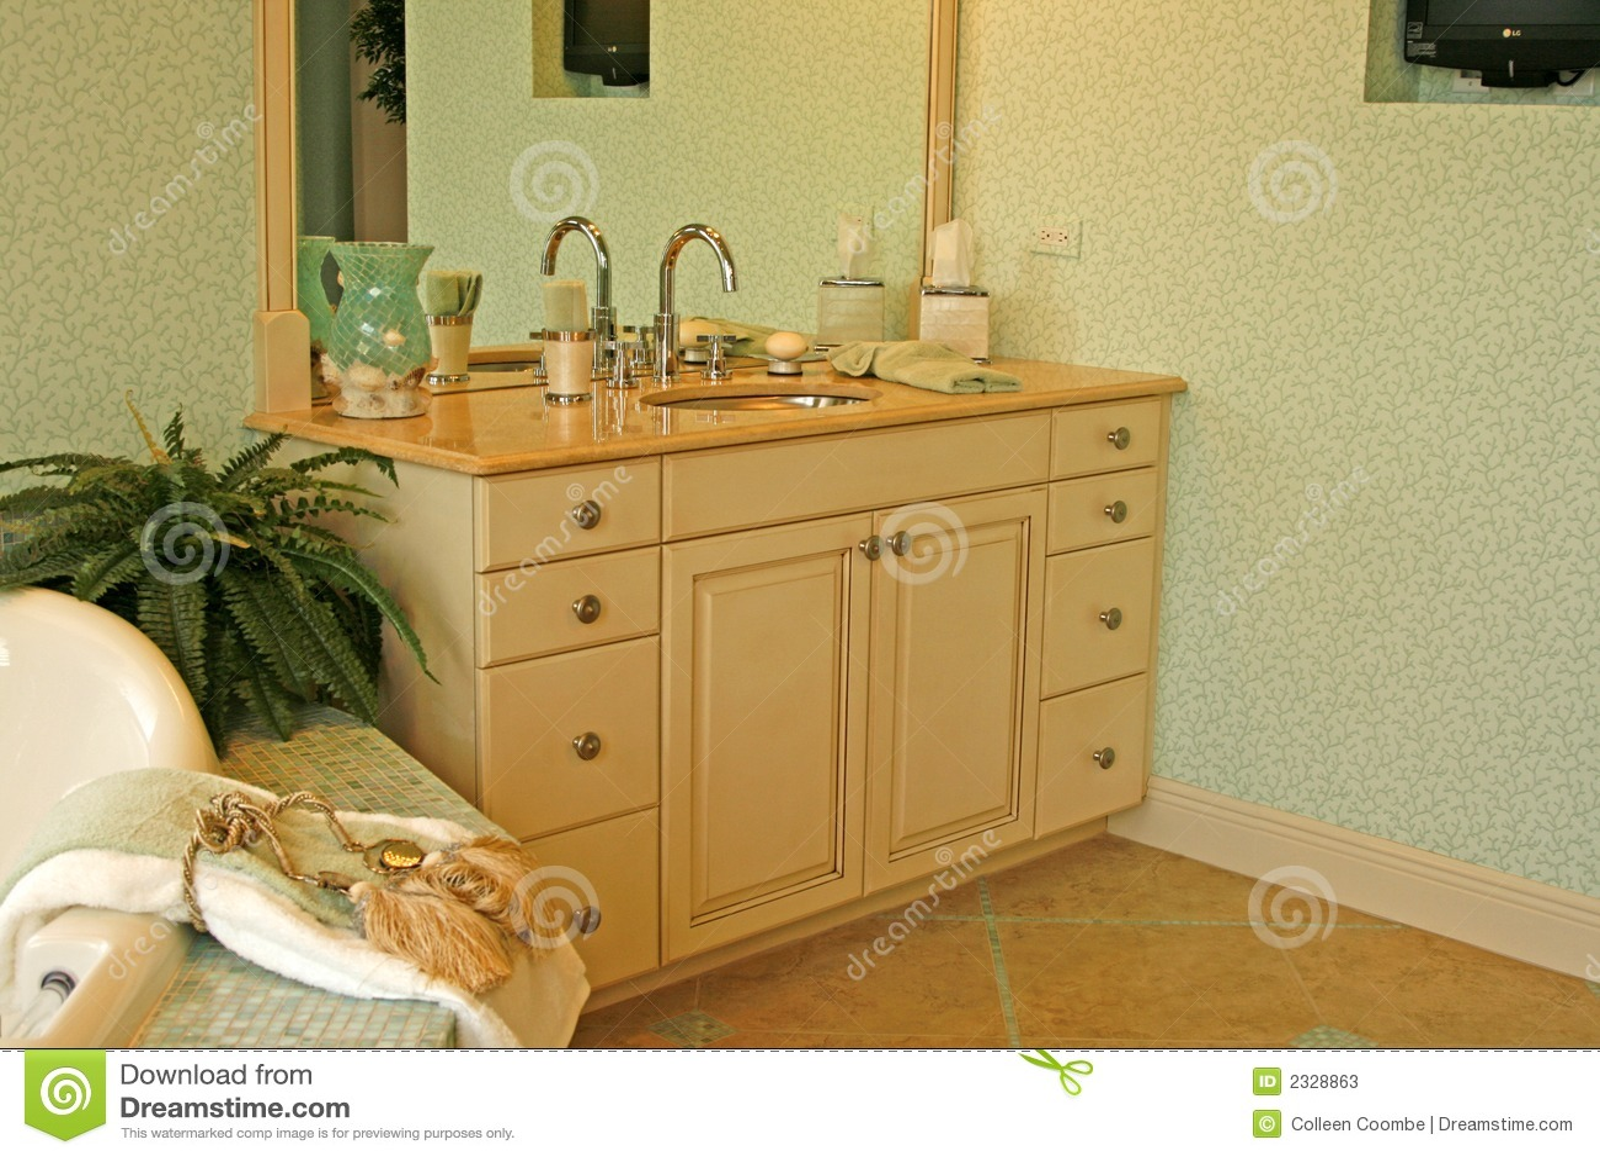 Bassin et module de salle de bains photos stock image for Module salle de bain